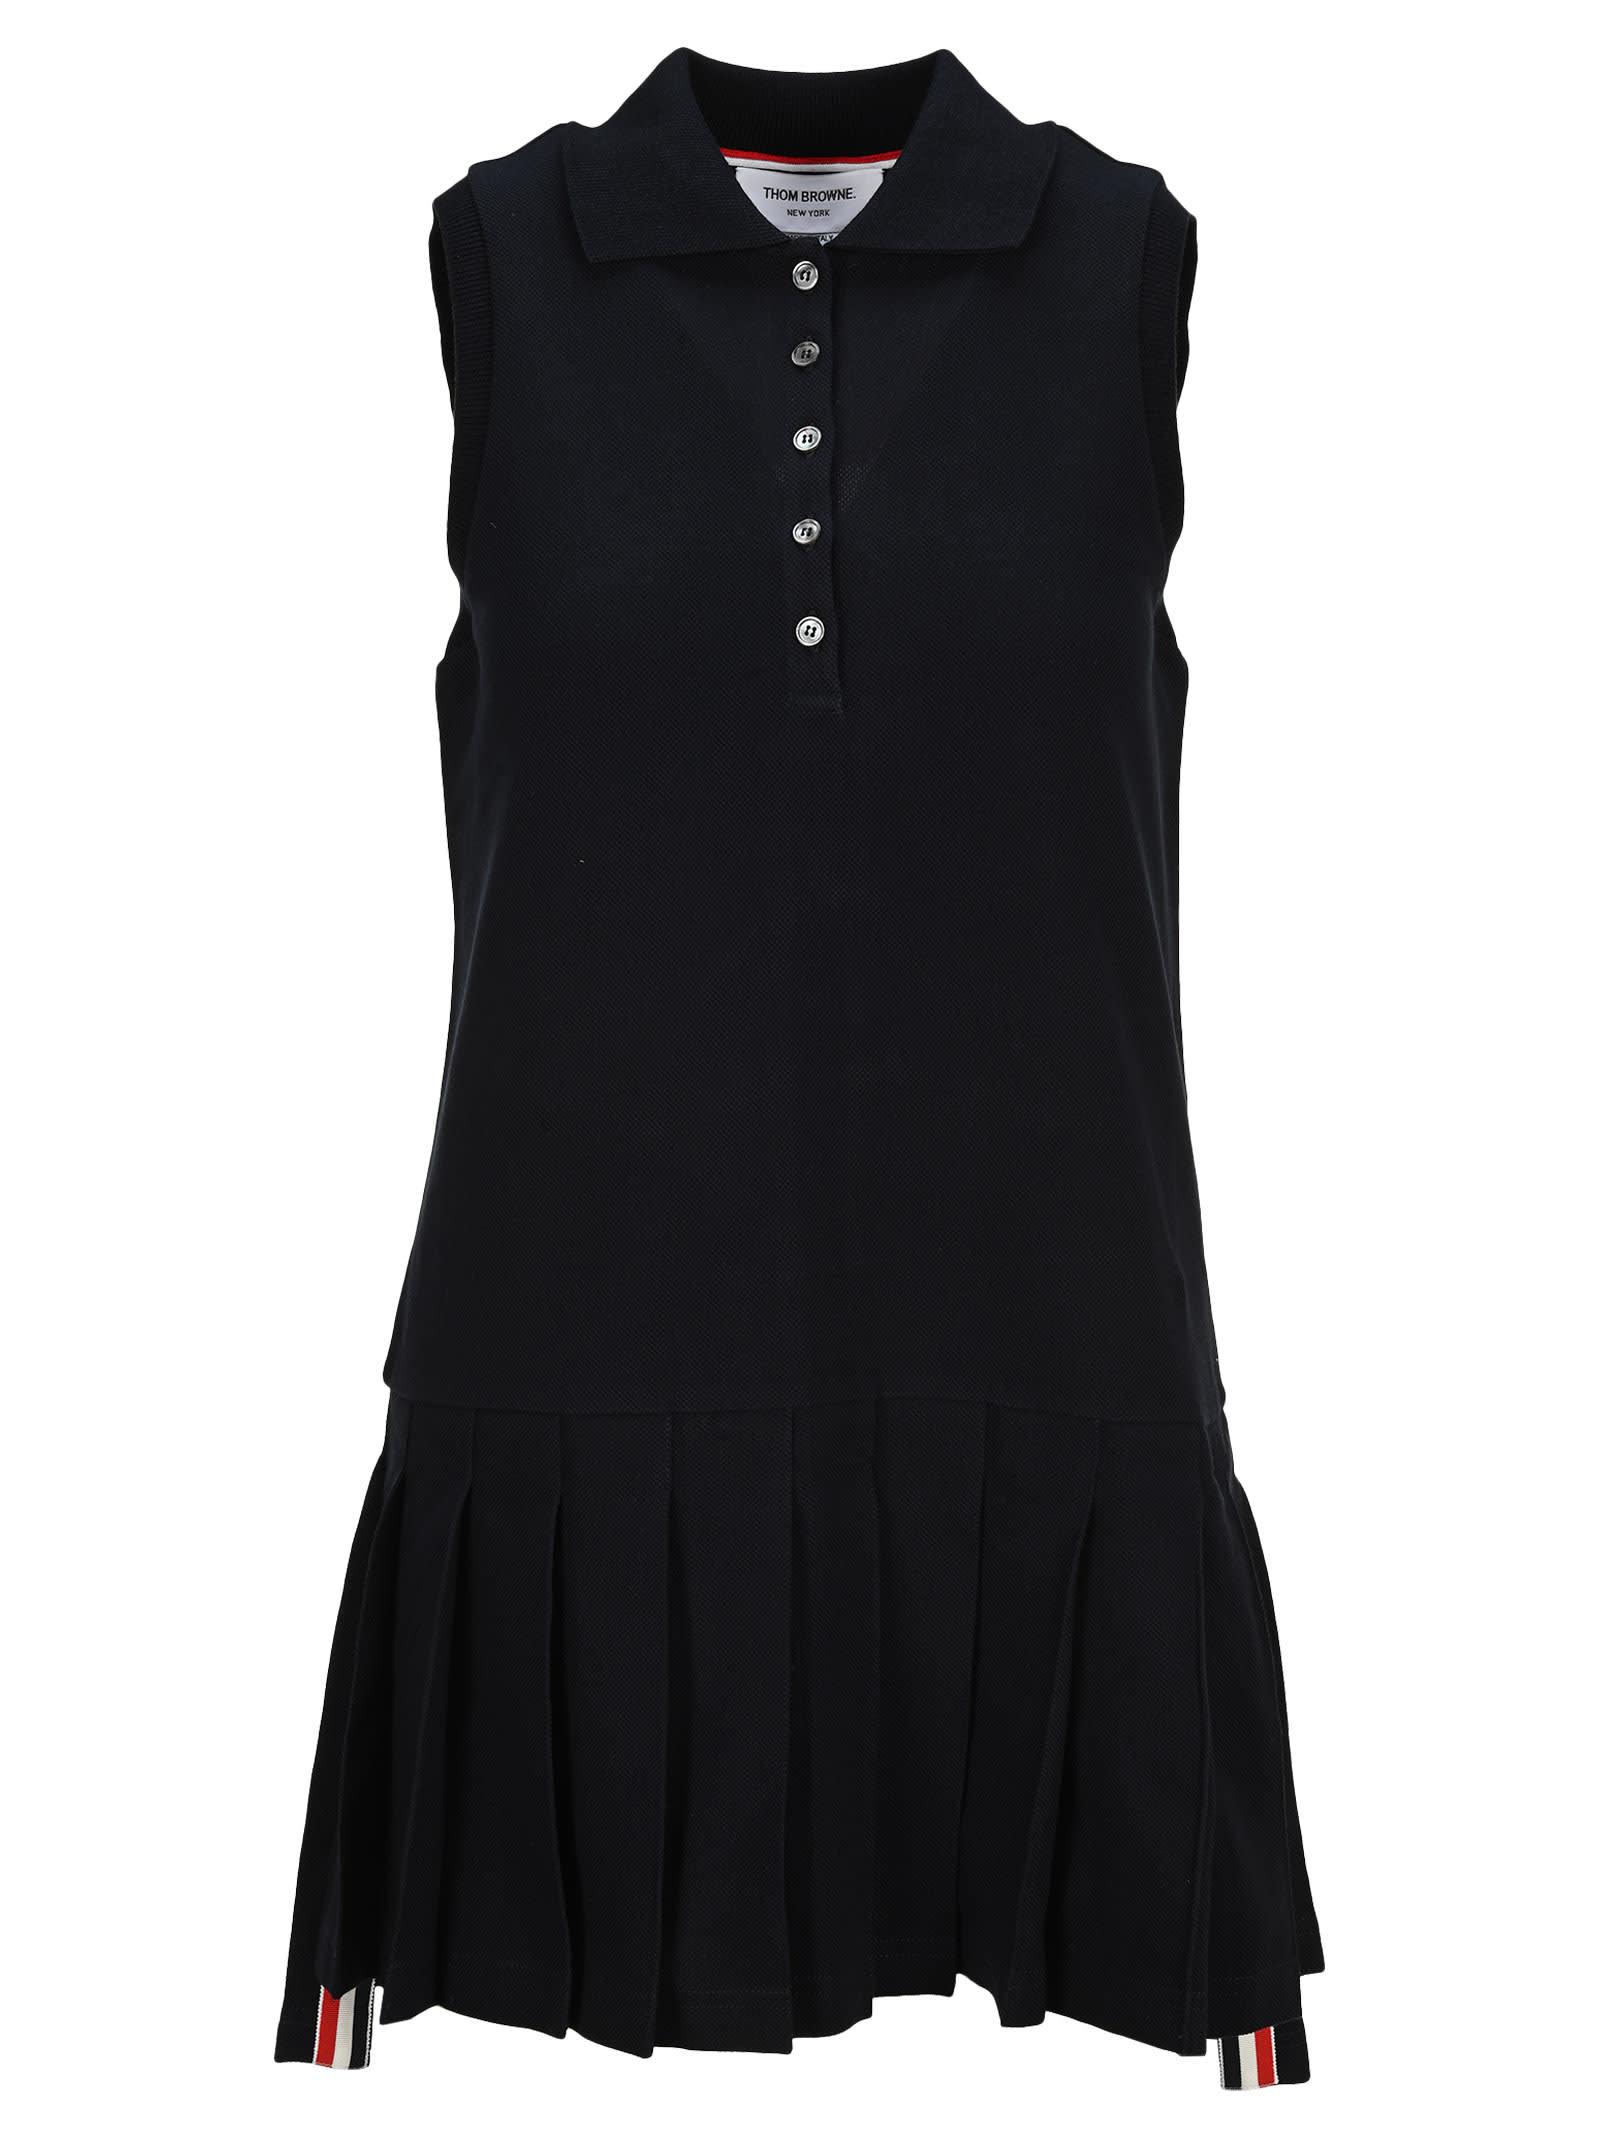 Buy Thom Browne Rwb Stripe Sleeveless Pleated Tennis Dress online, shop Thom Browne with free shipping